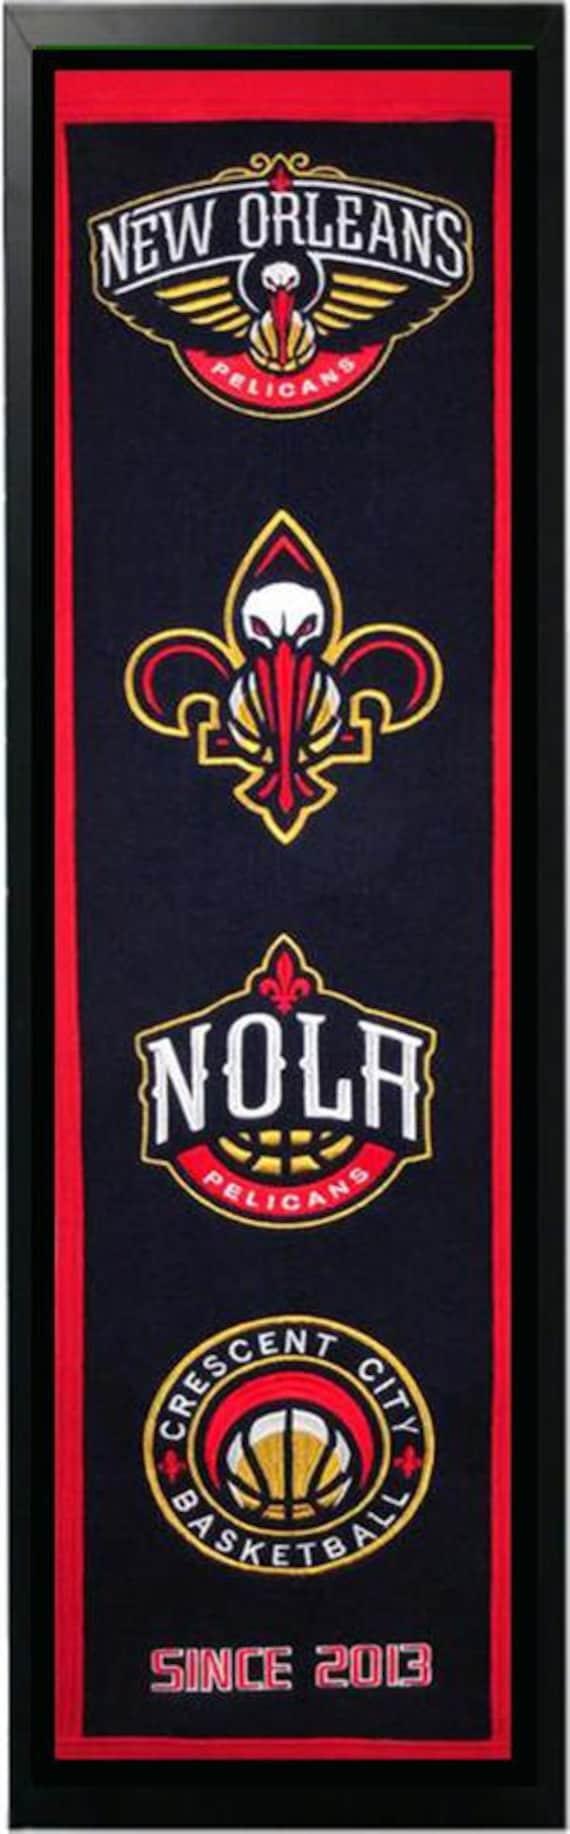 New Orleans Pelicans Logo History Felt Banner Frame 14 X 37 Etsy